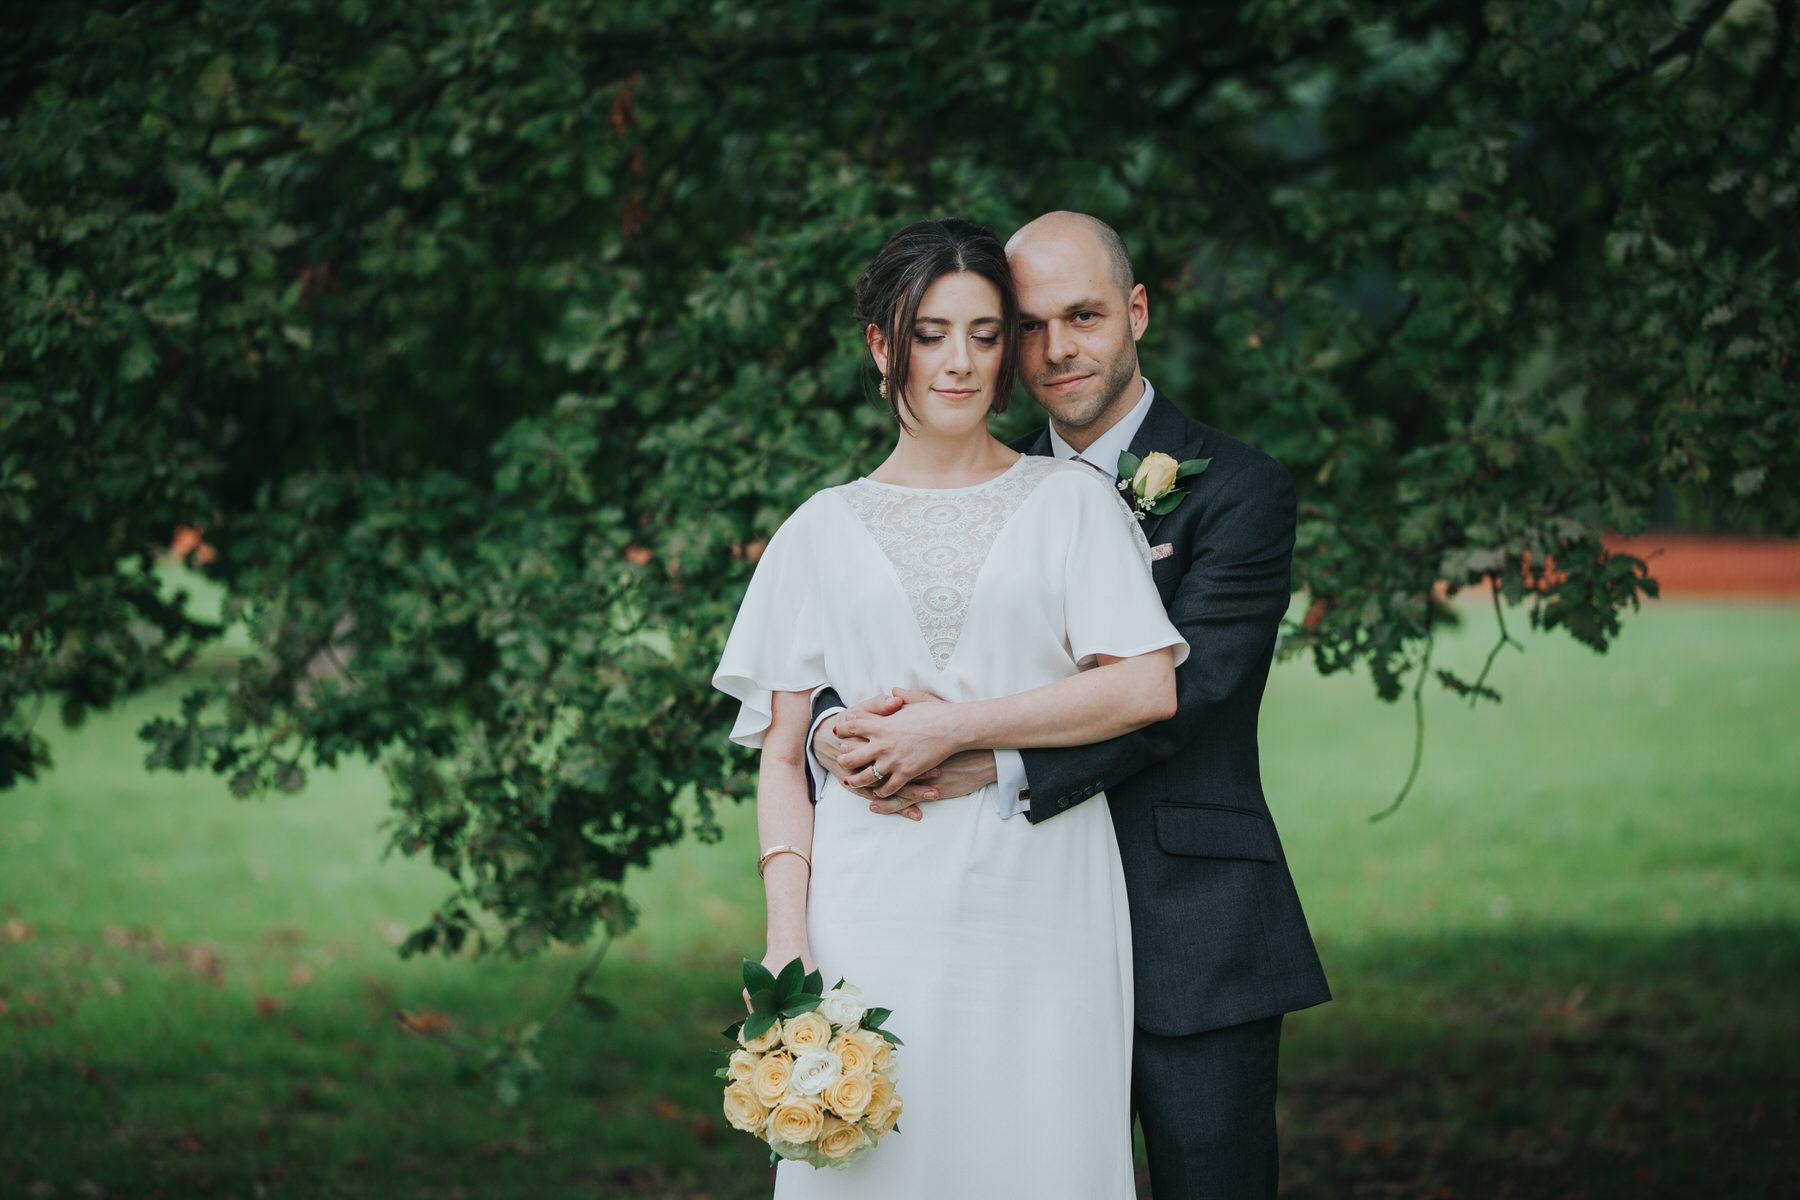 171 bride groom intimate wedding portraits under tree.jpg